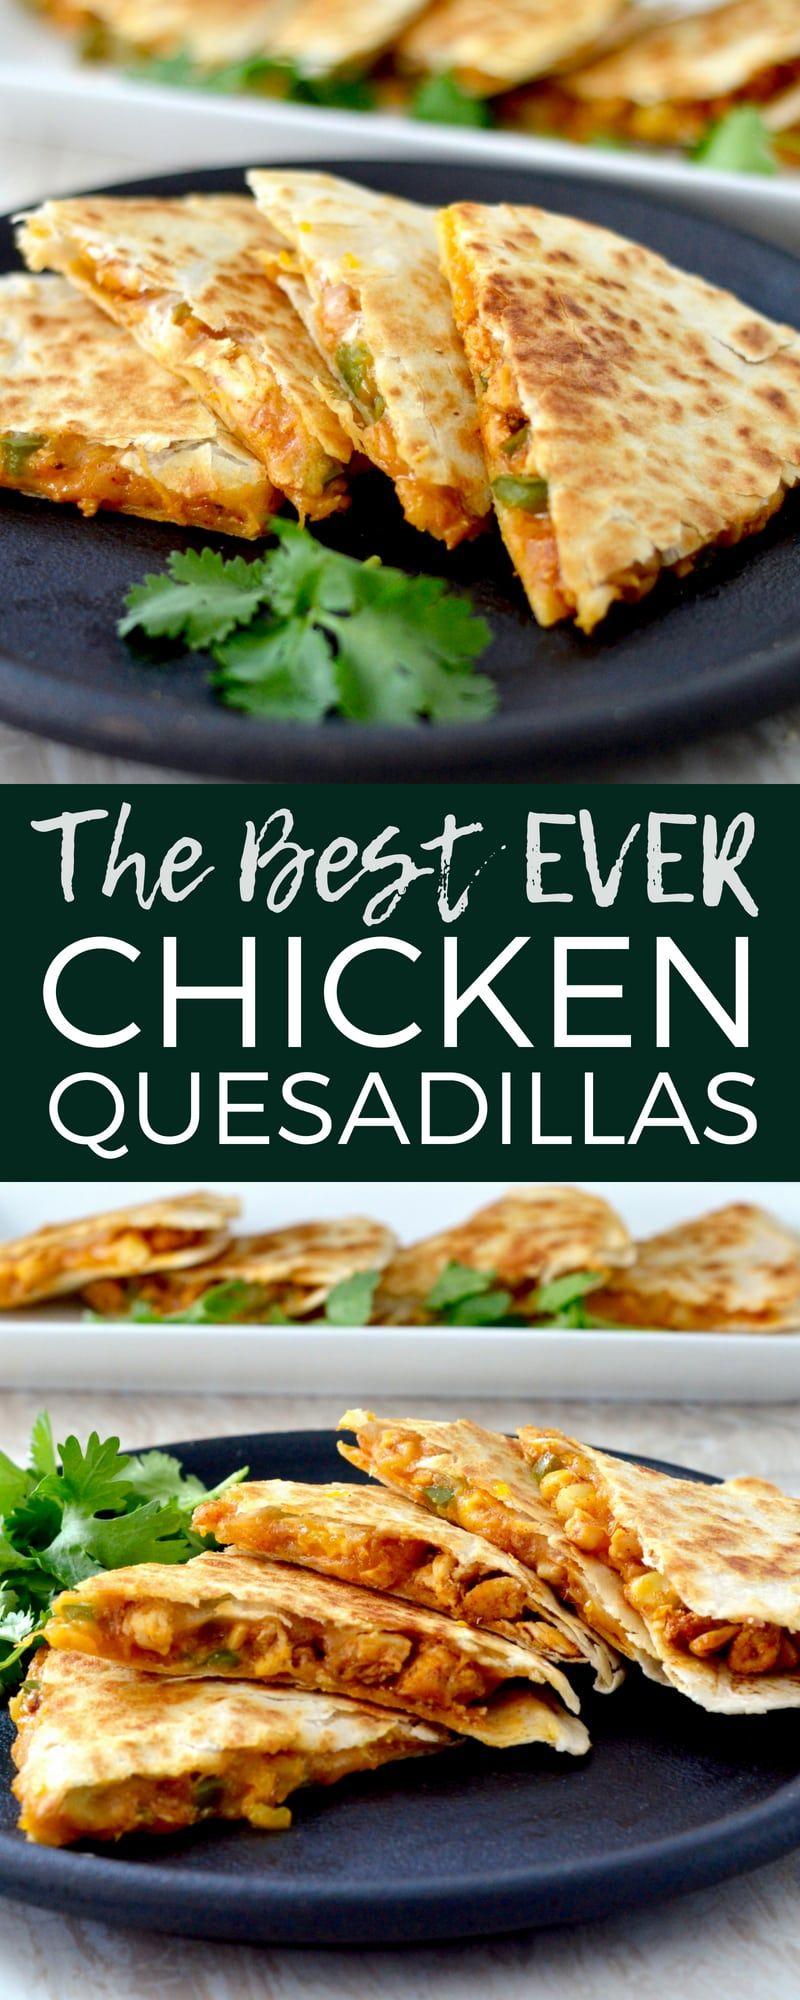 Best Chicken Quesadilla Recipe #quickeasydinners